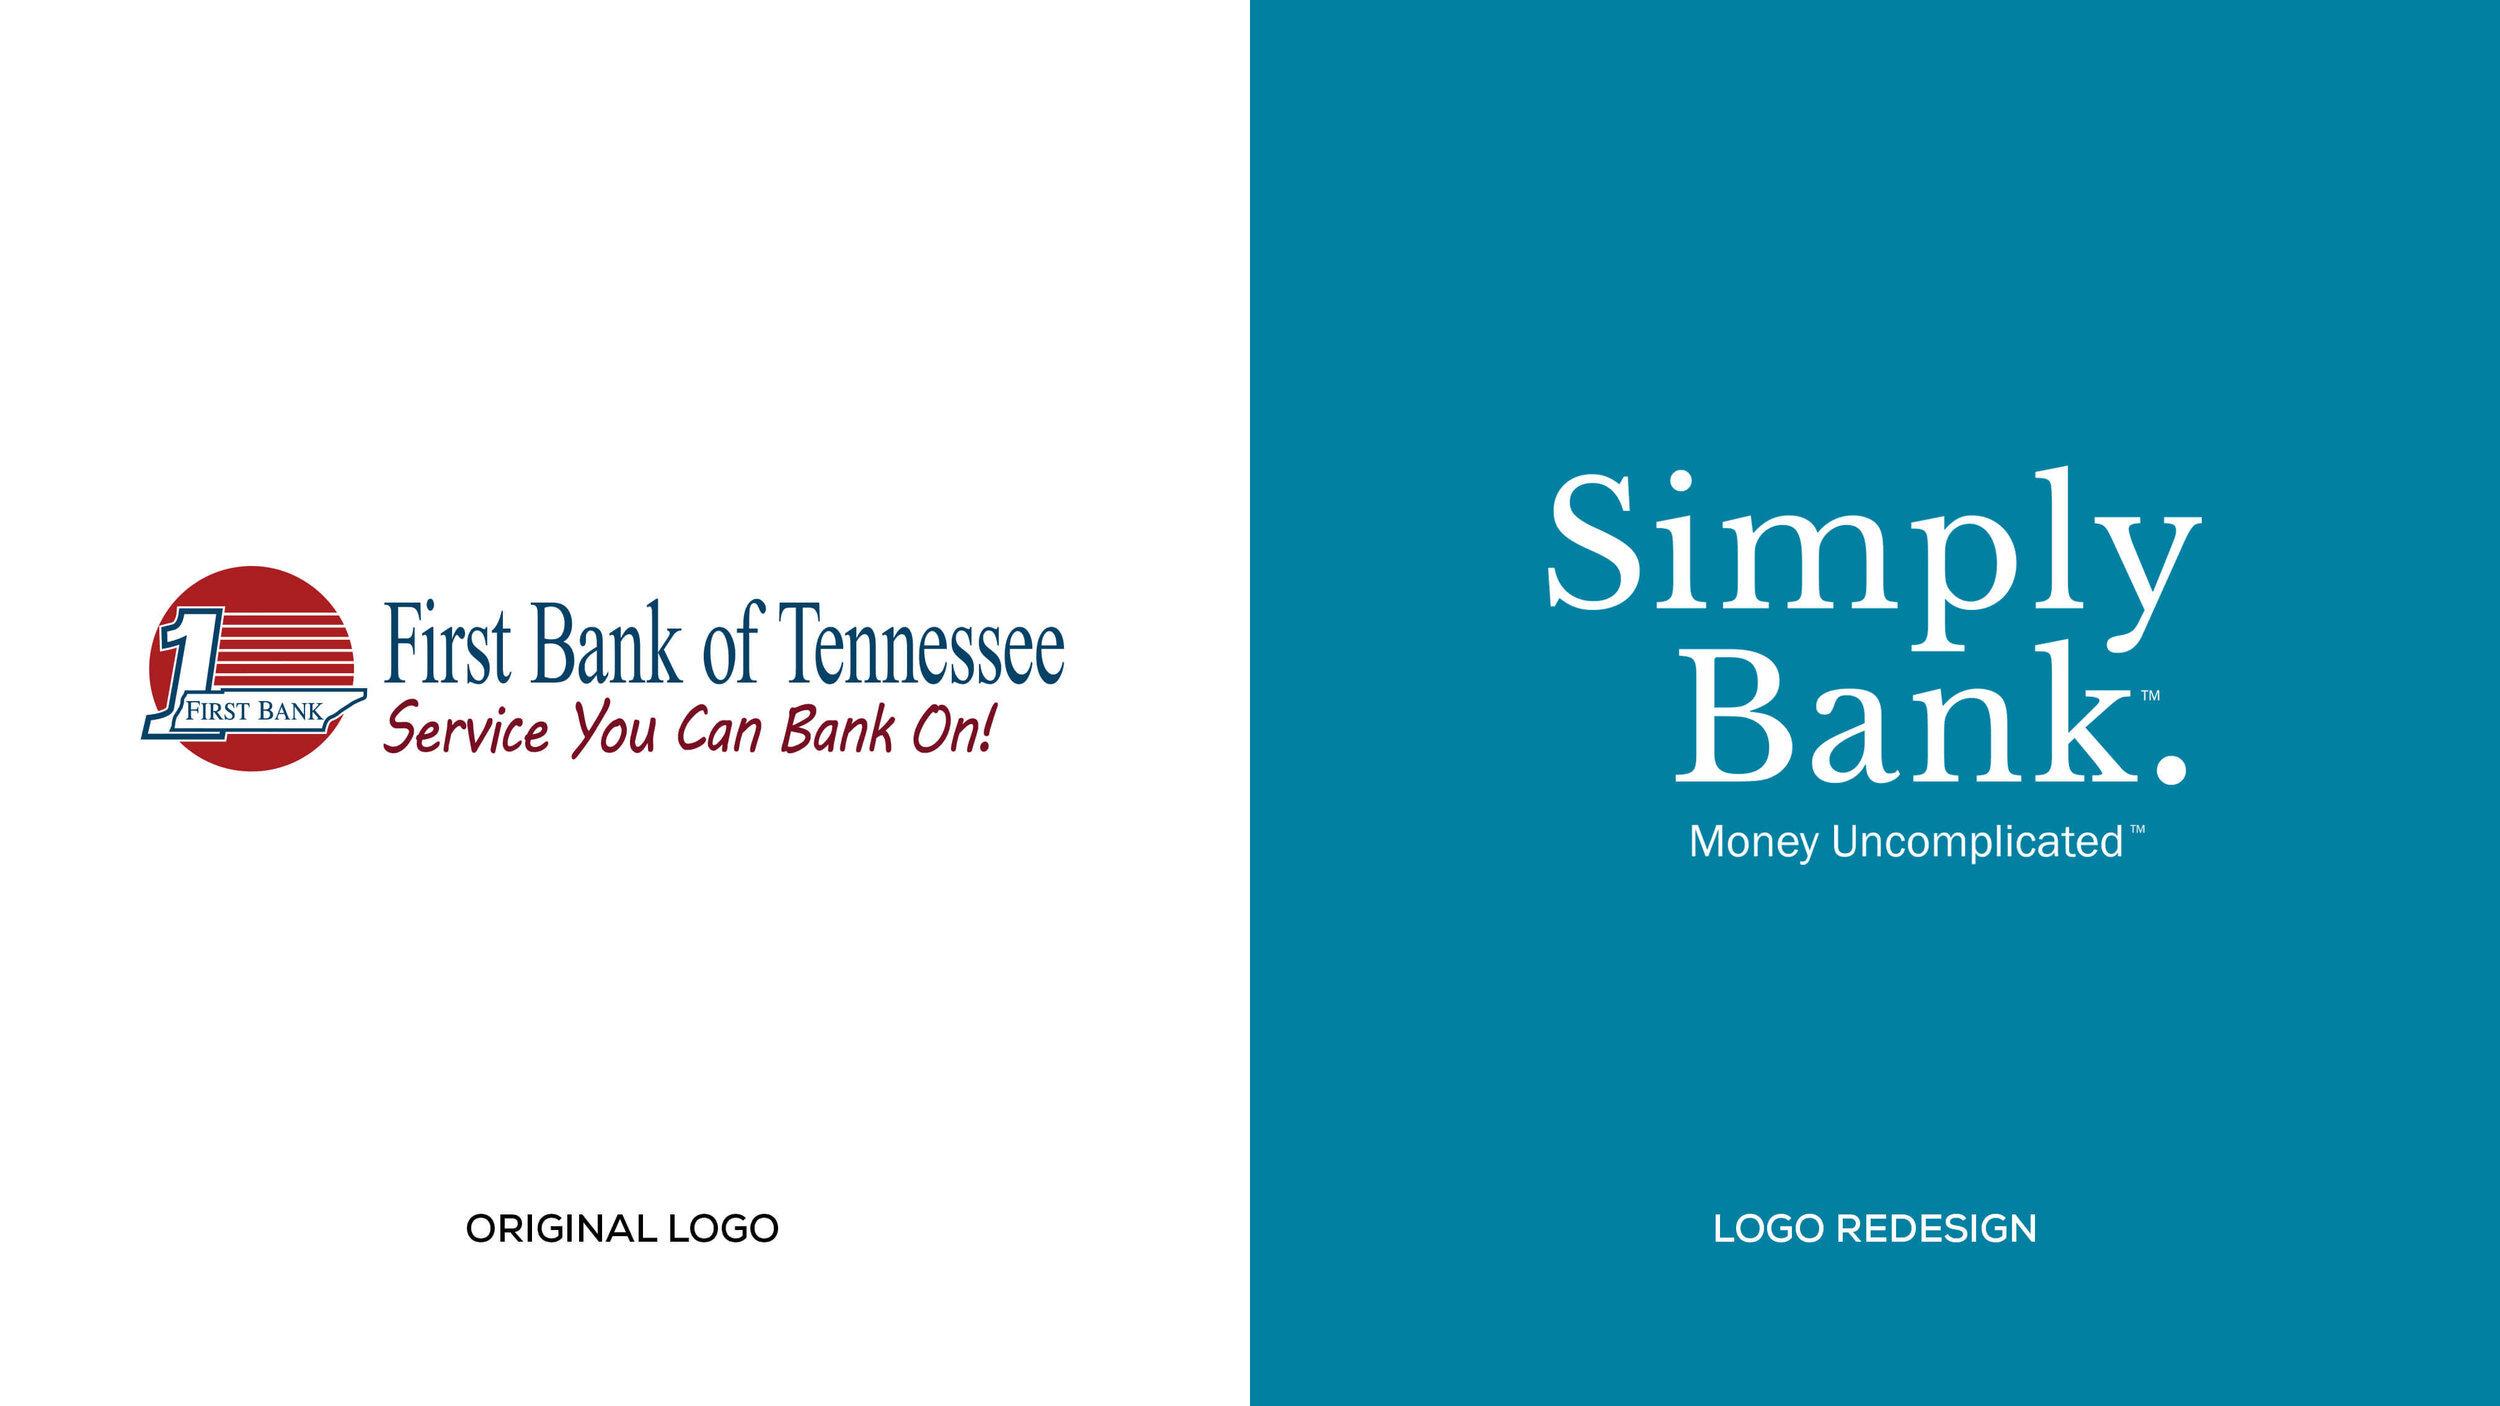 simply-bank-logo-comparison.jpg